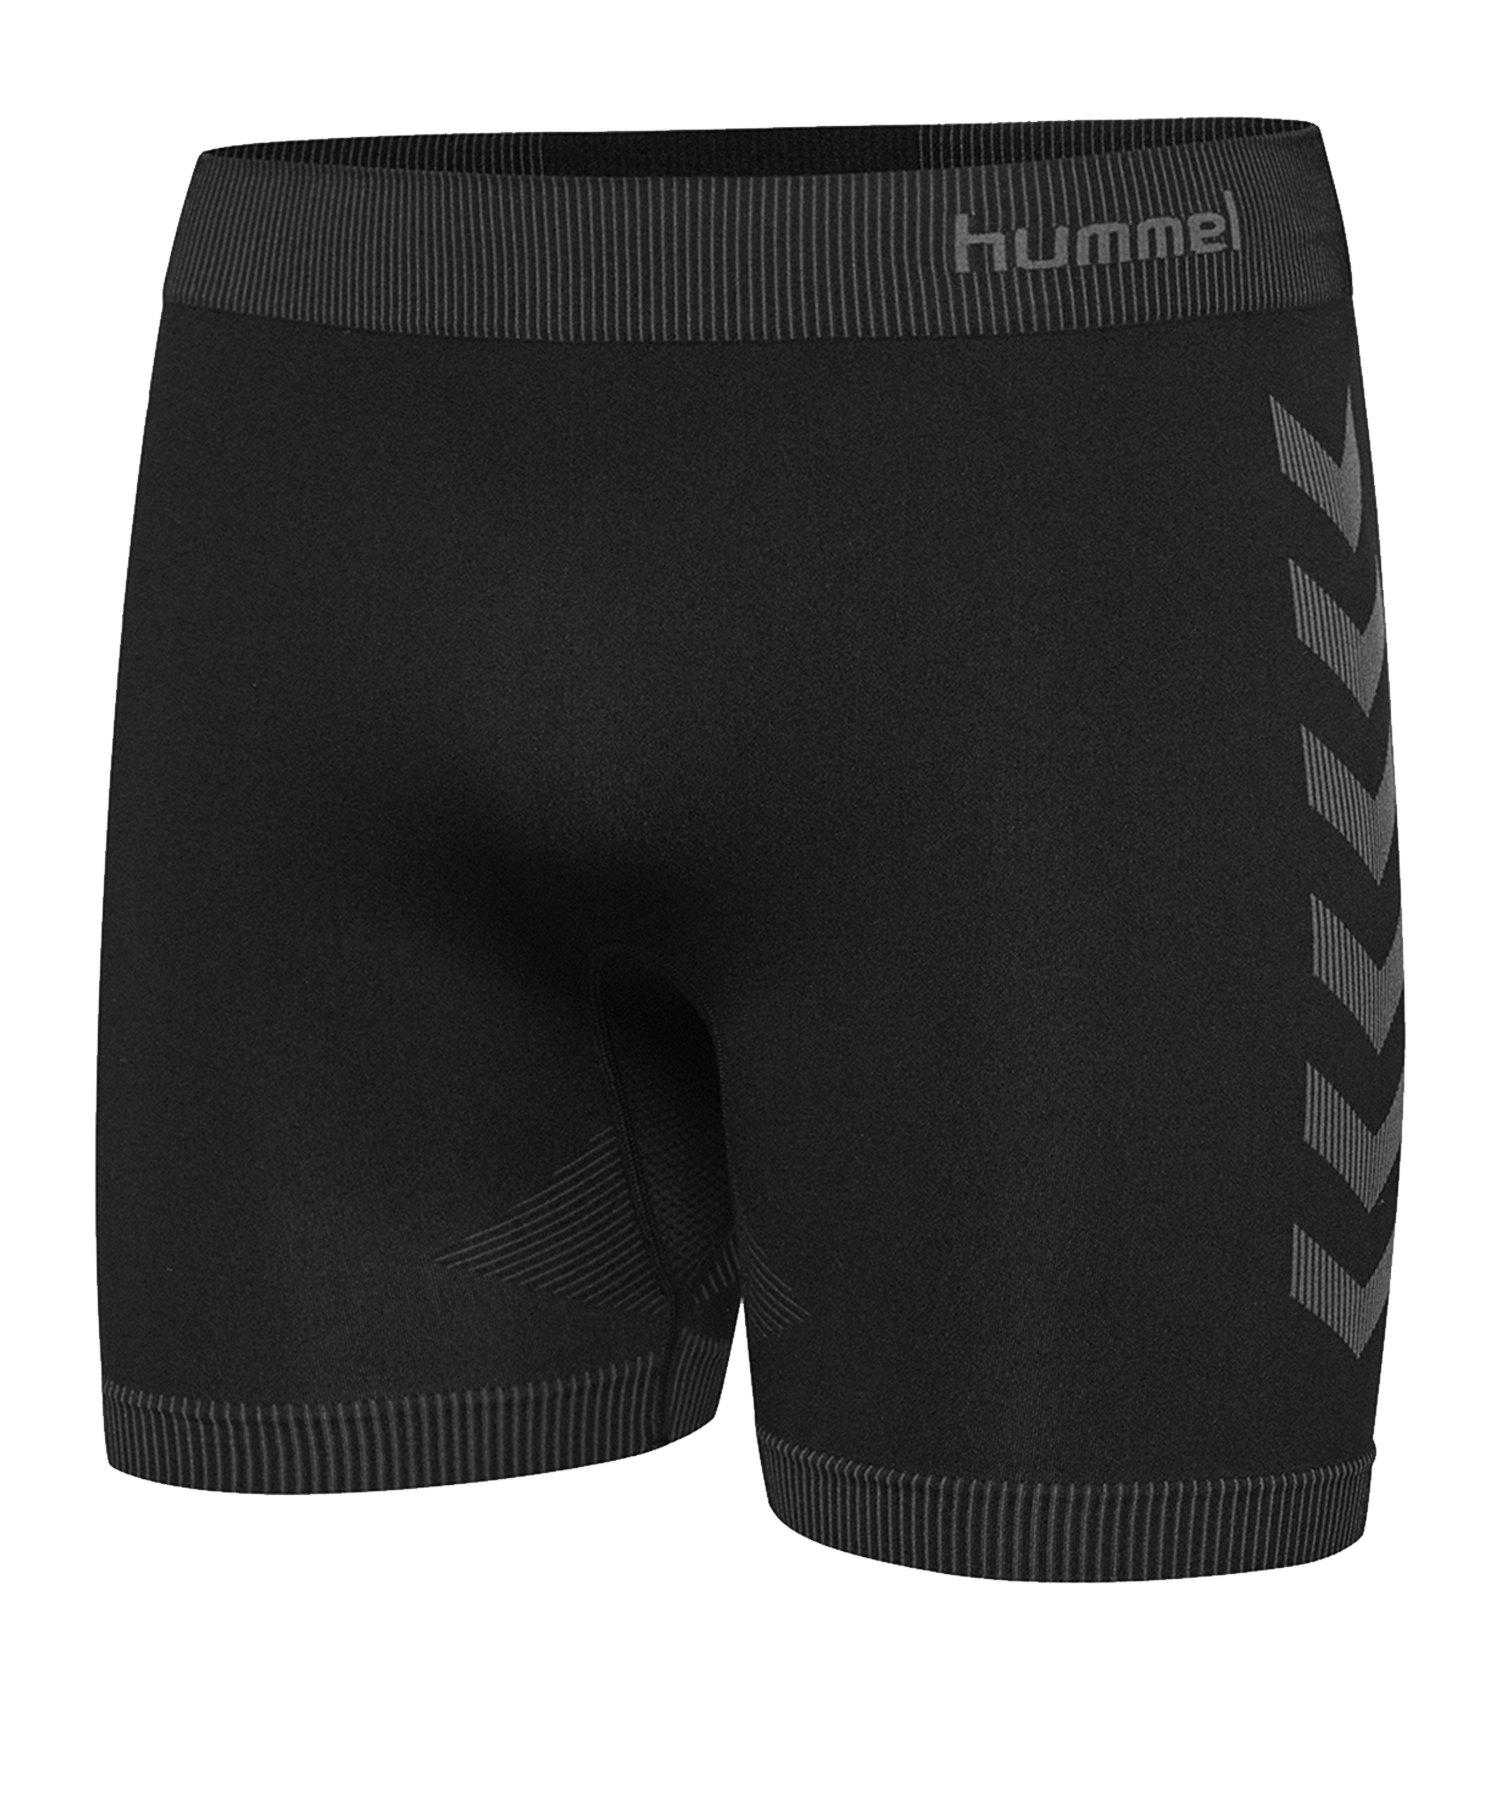 Hummel First Seamless Short Schwarz F2001 - schwarz